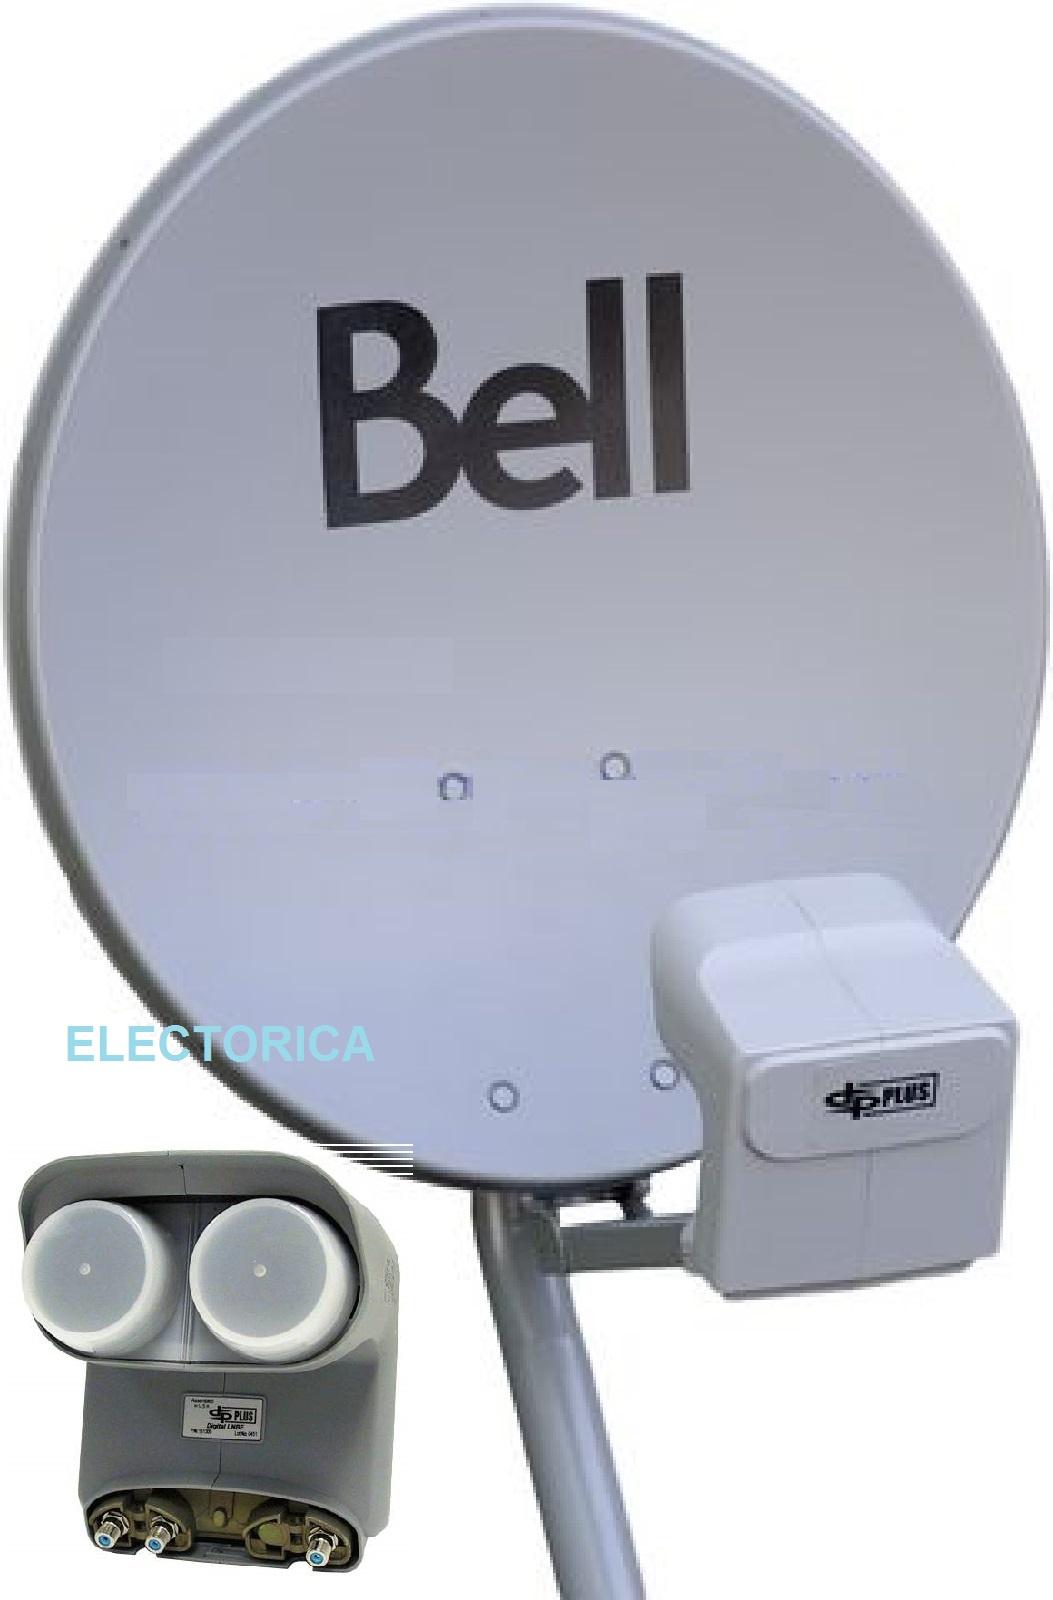 bell hd satellite dish wiring diagram 1999 s10 radio 20 quot original 500 w twin dpp lnb for